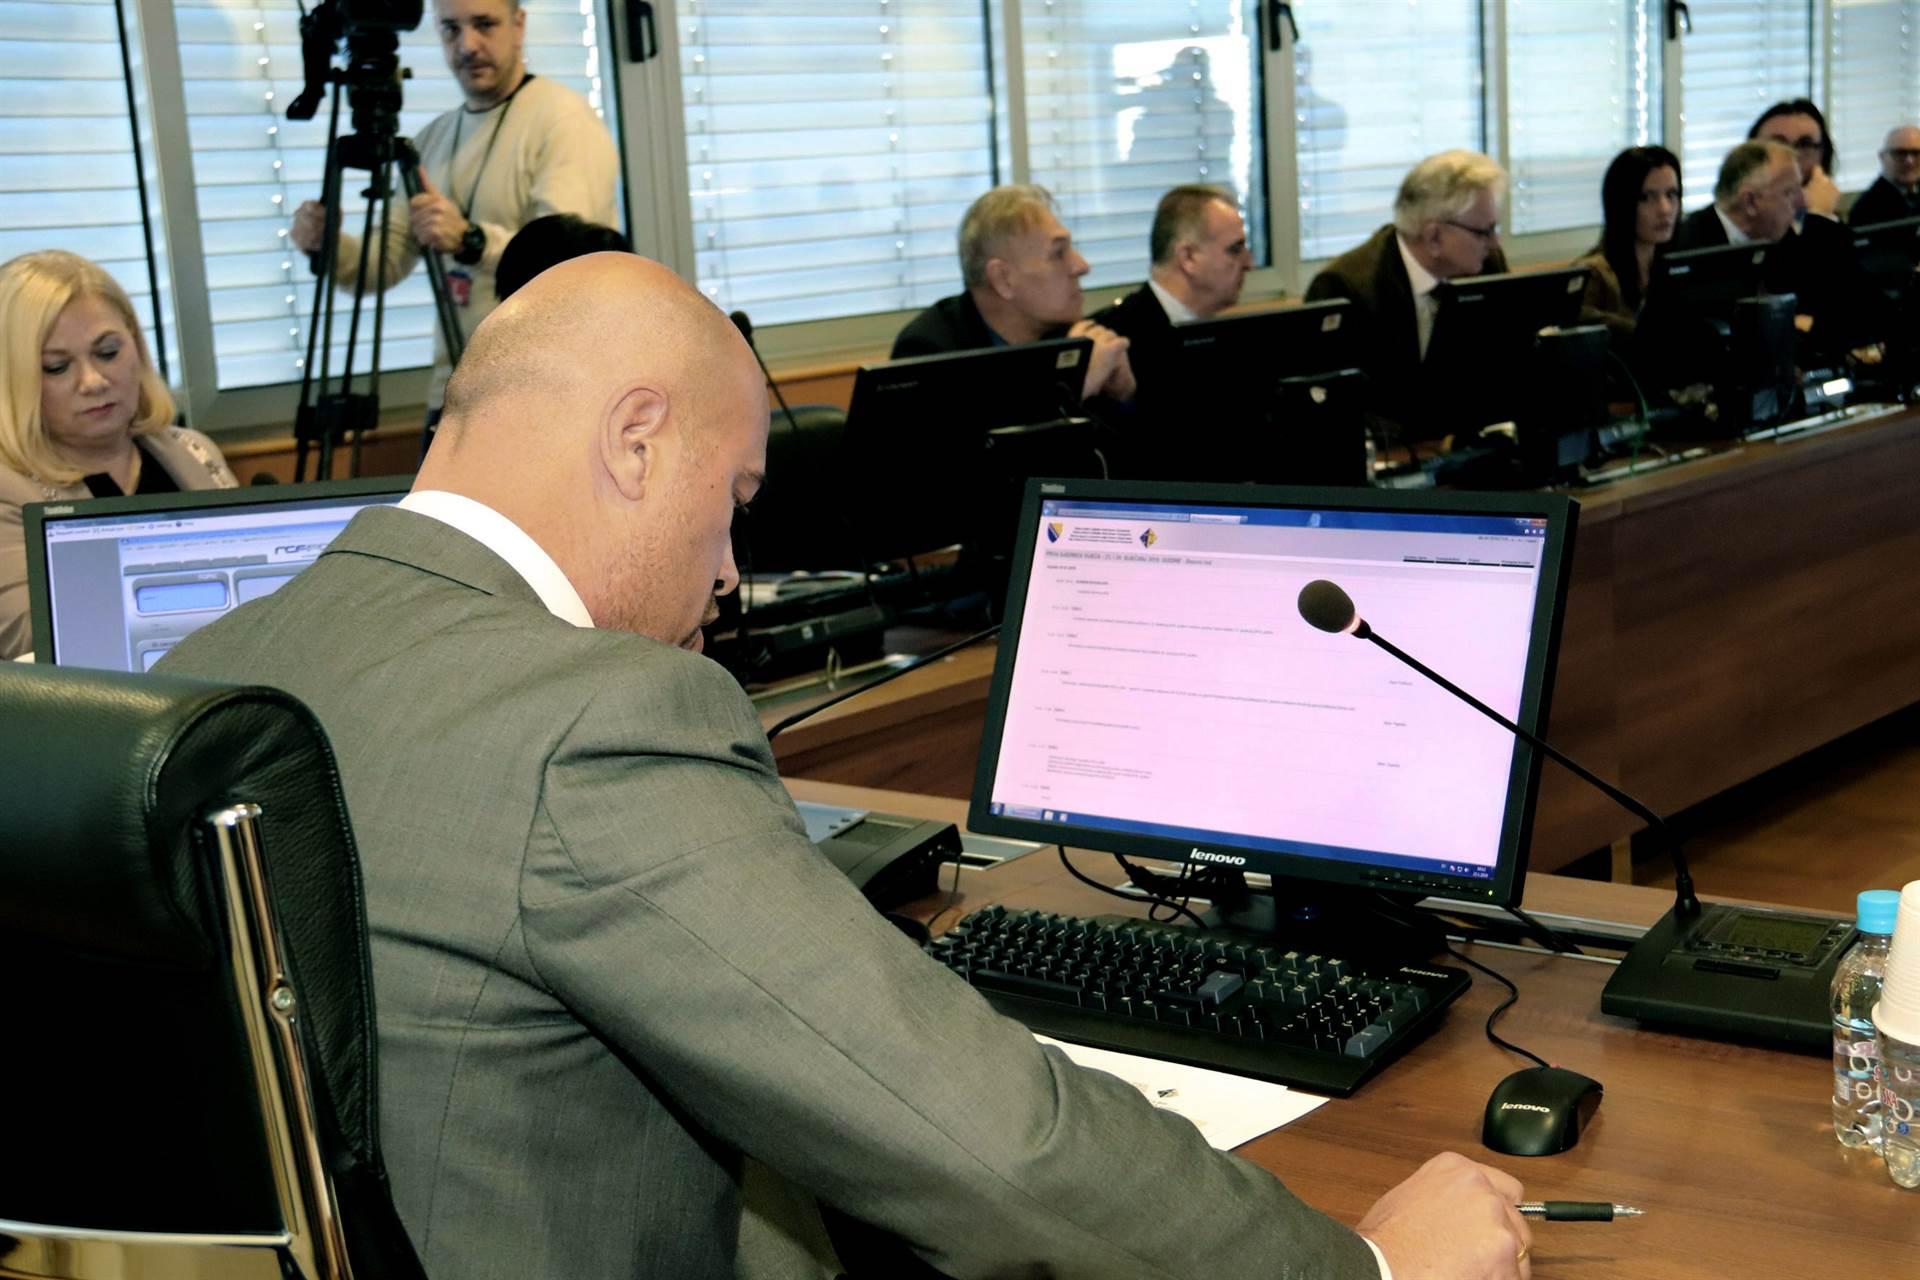 VSTV: Istražna komisija Parlamenta predstavlja pritisak